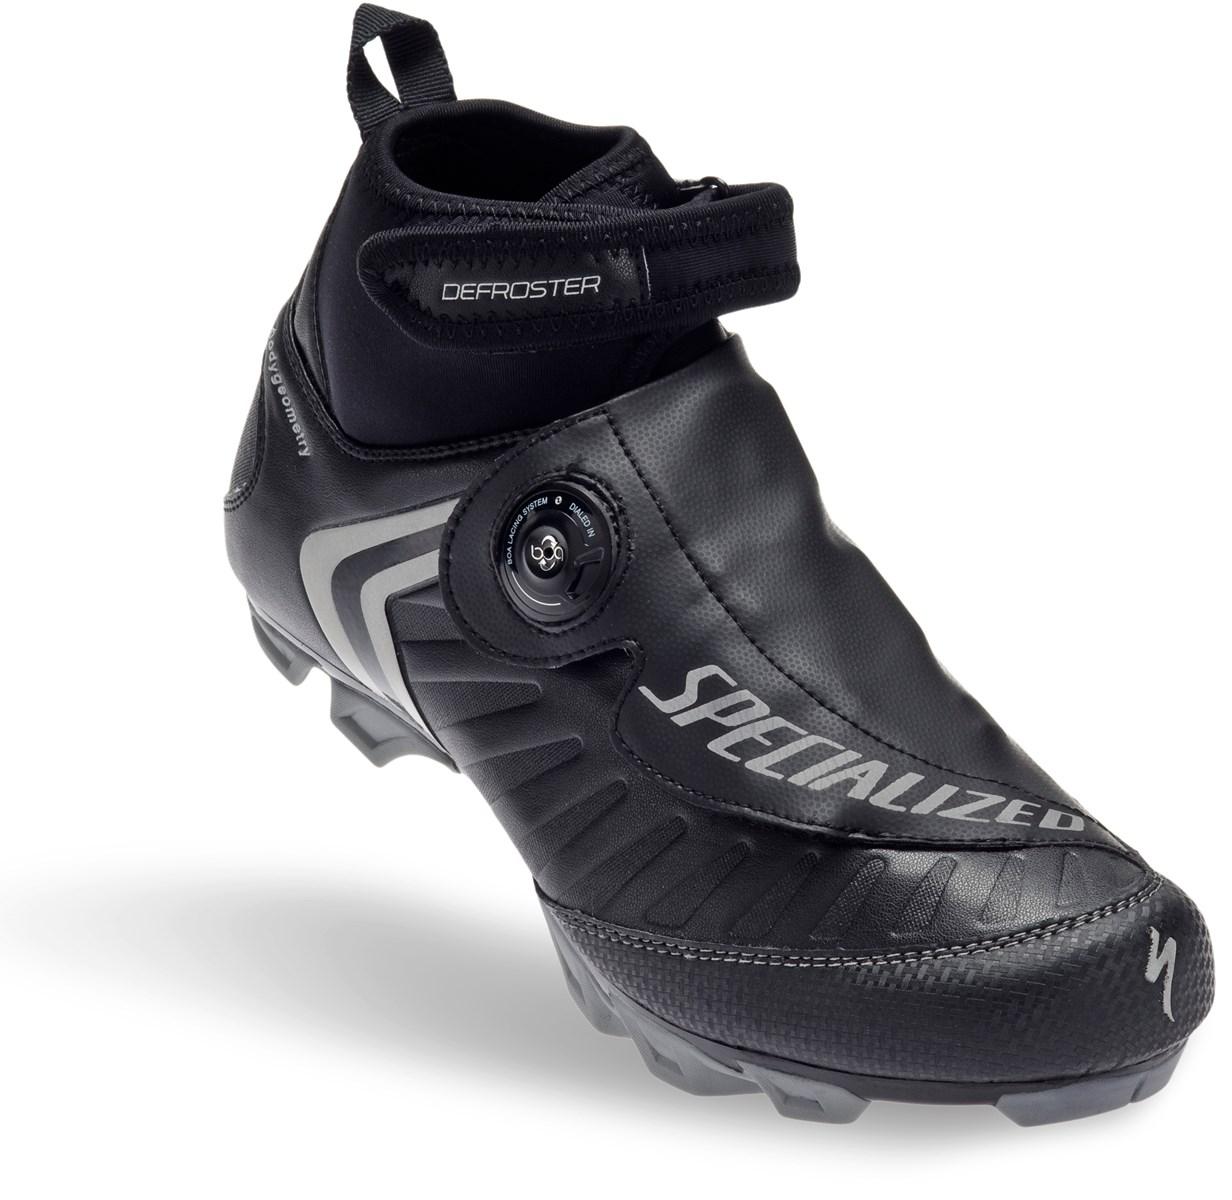 aba8ce12d2e Specialized Defroster MTB Shoe - Size 47 - Black £75.00